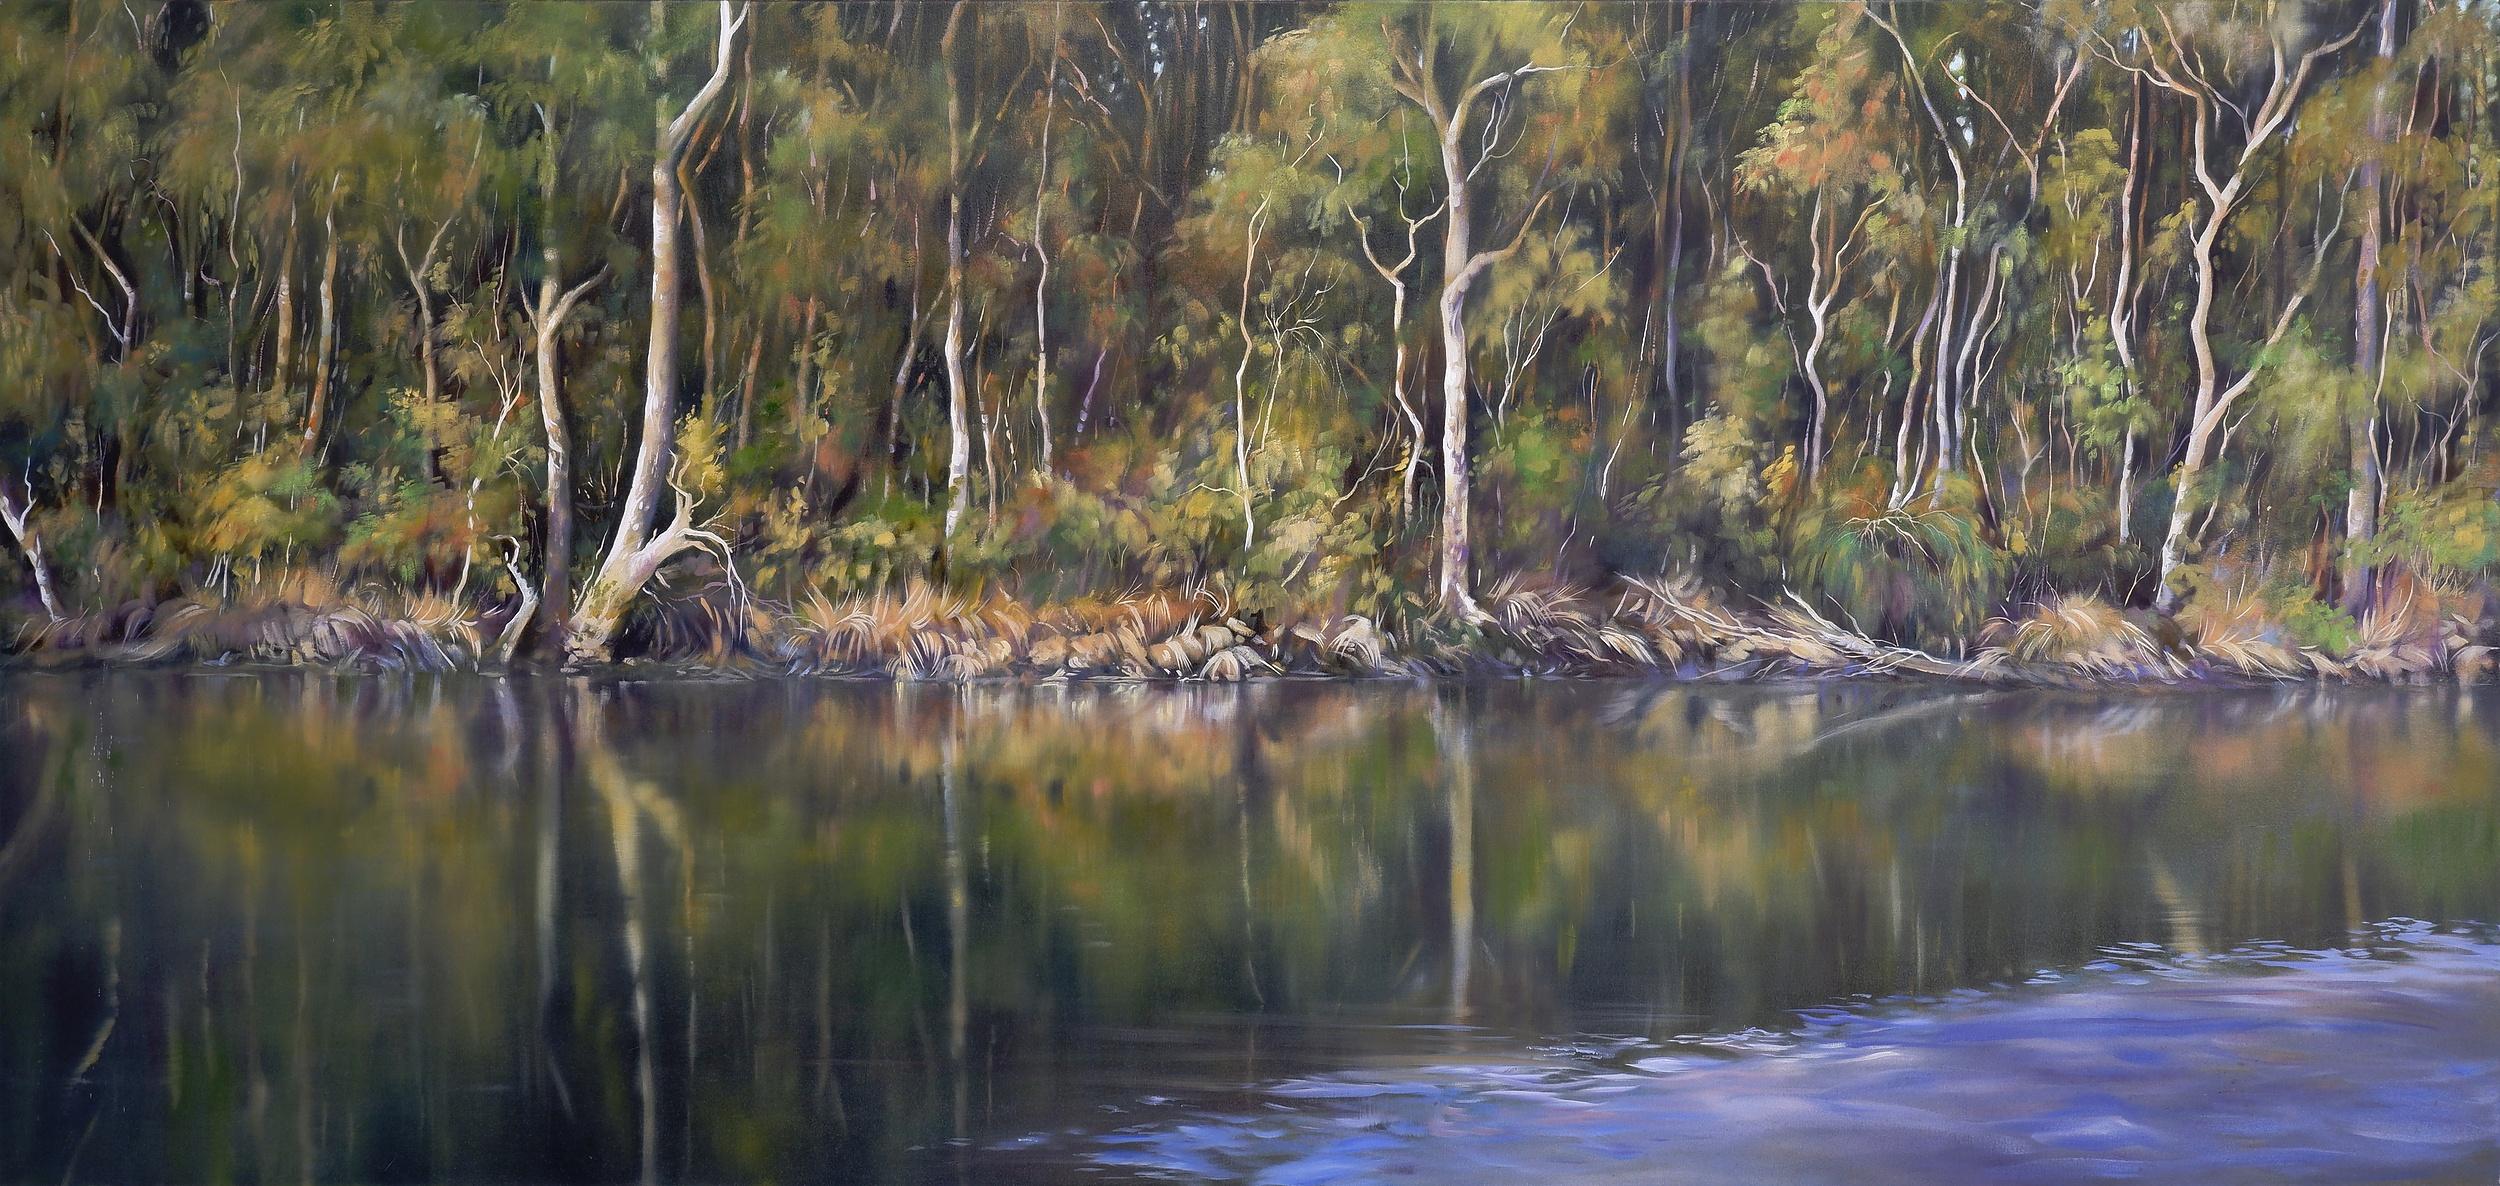 'Tanya Nelipa (born 1956), Bermagui River, Oil on Canvas, 101 x 213 cm'